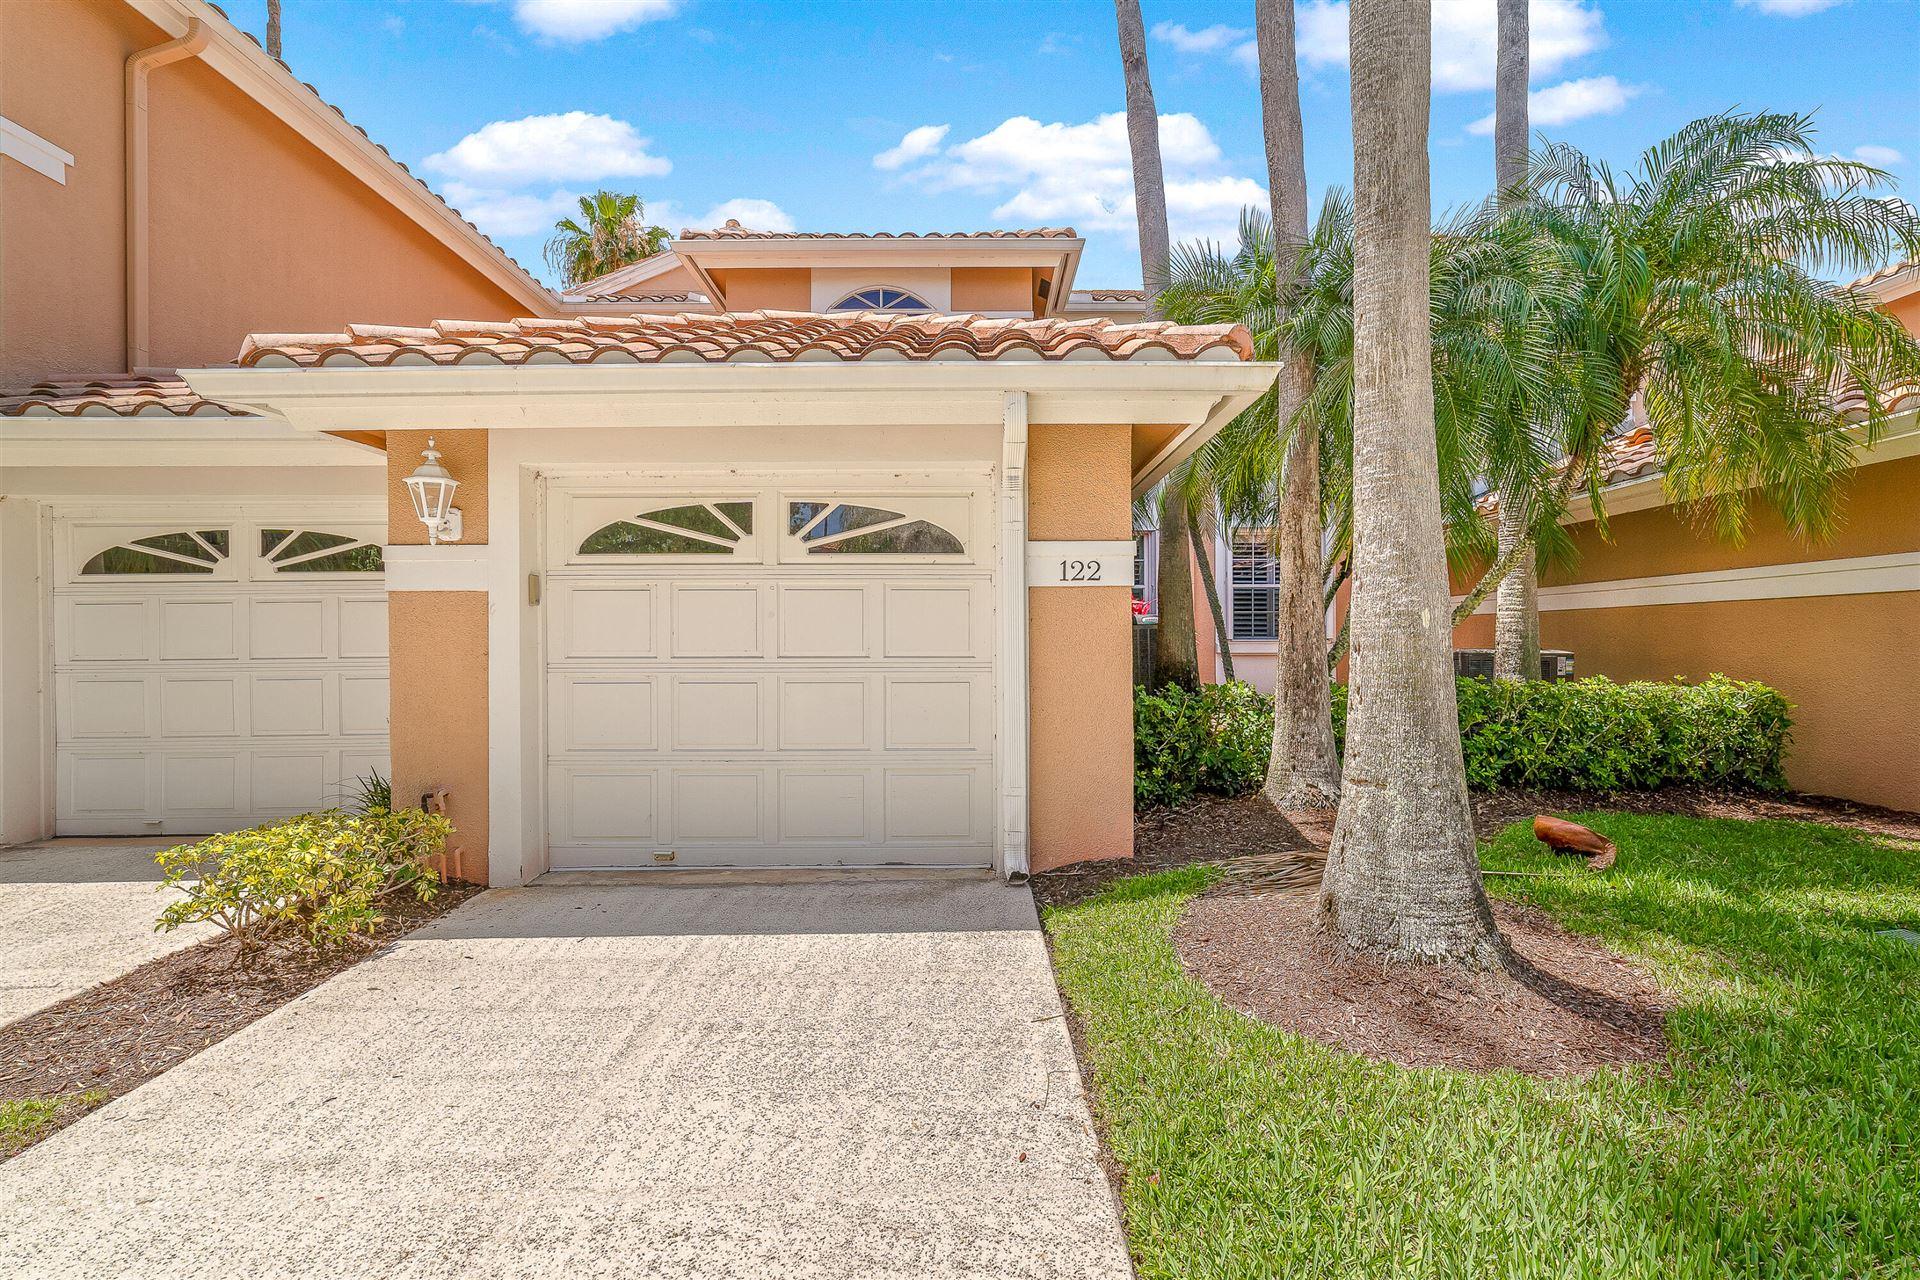 Photo of 122 Legendary Circle, Palm Beach Gardens, FL 33418 (MLS # RX-10730757)